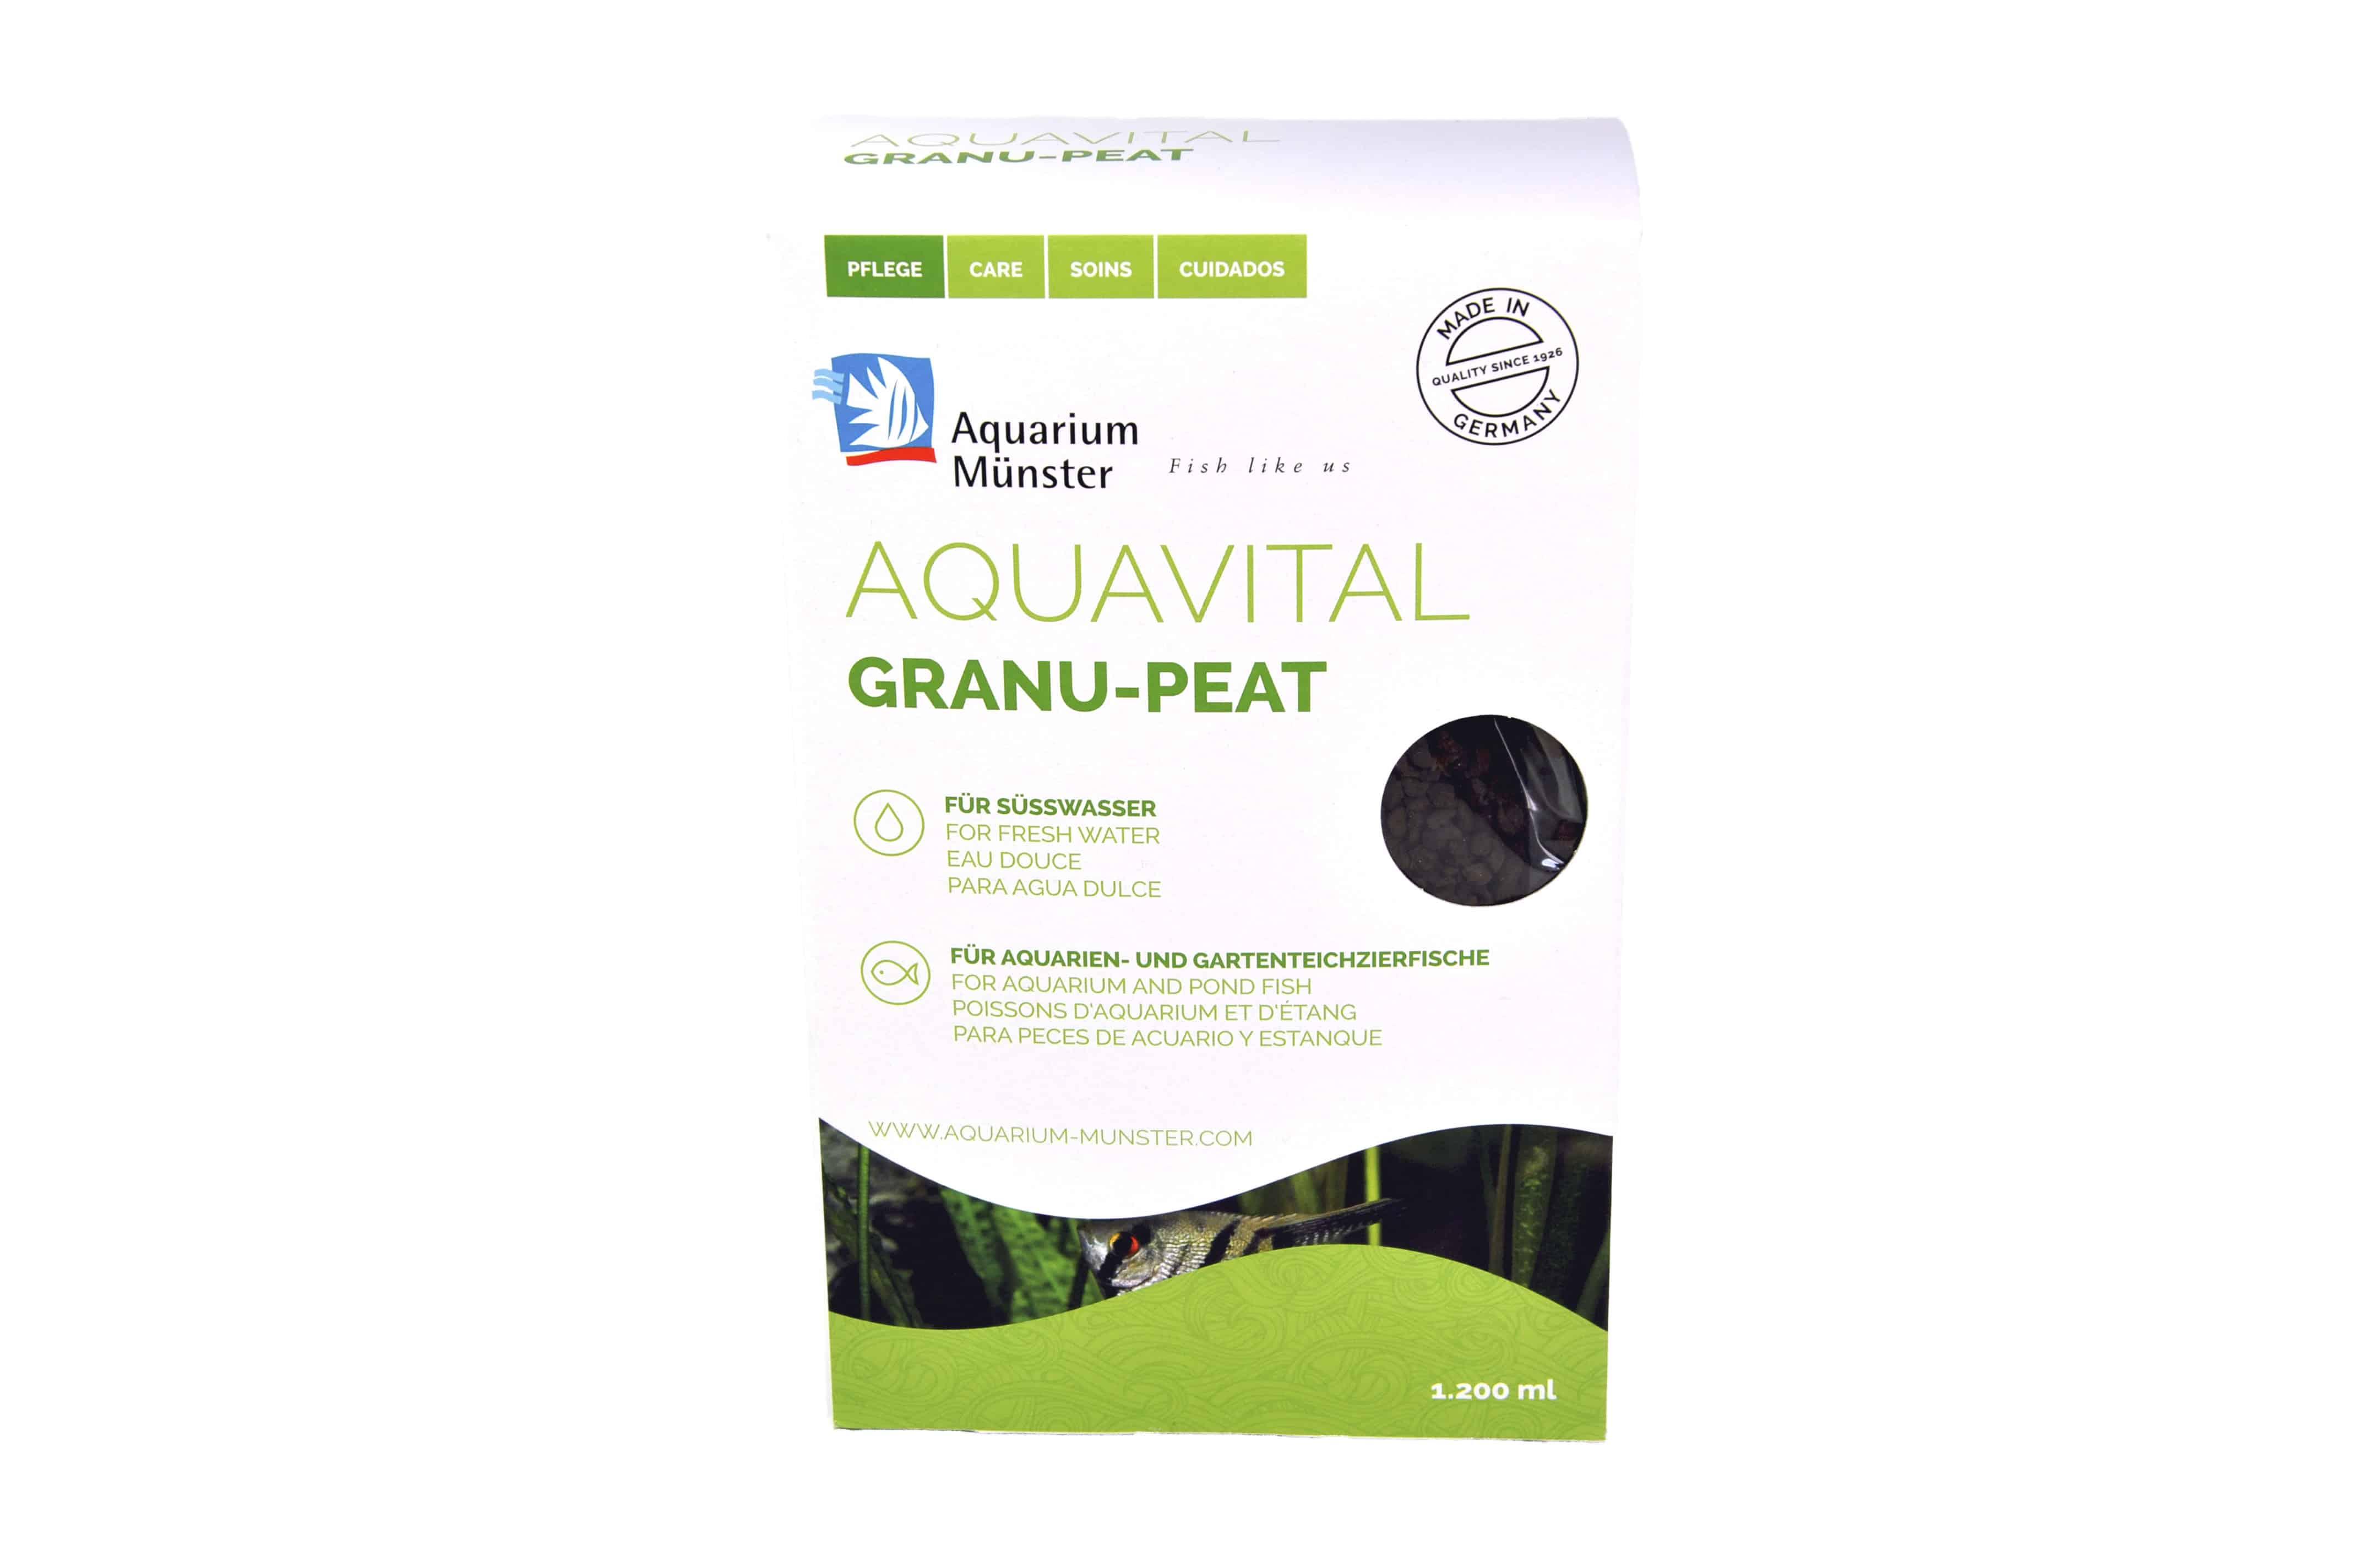 AQUAVITAL GRANU-PEAT